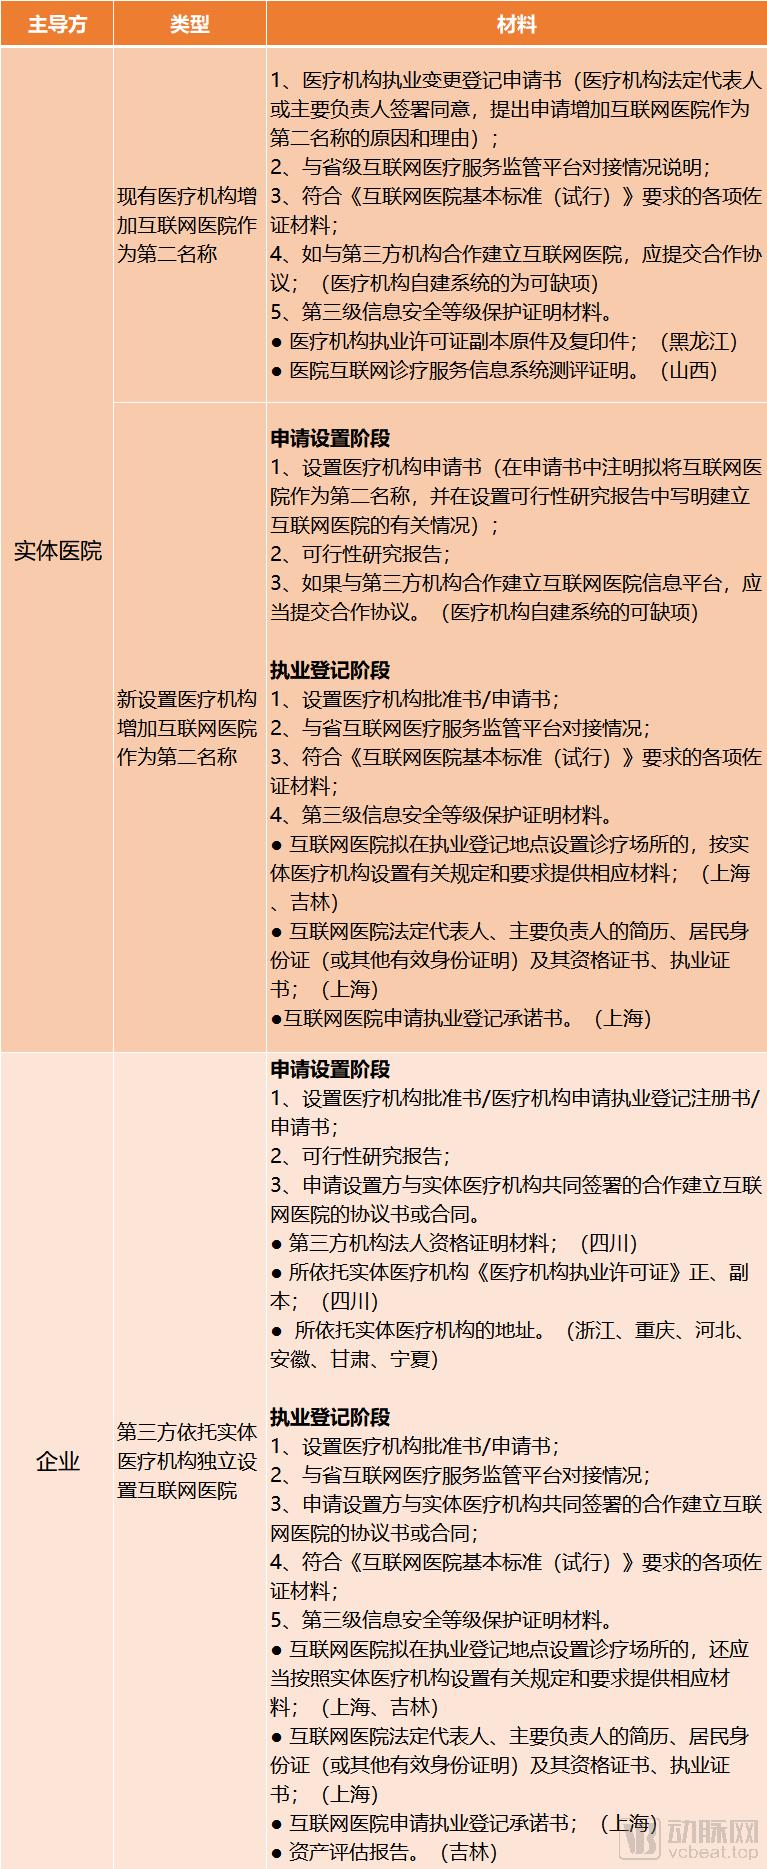 C图申办材料.png